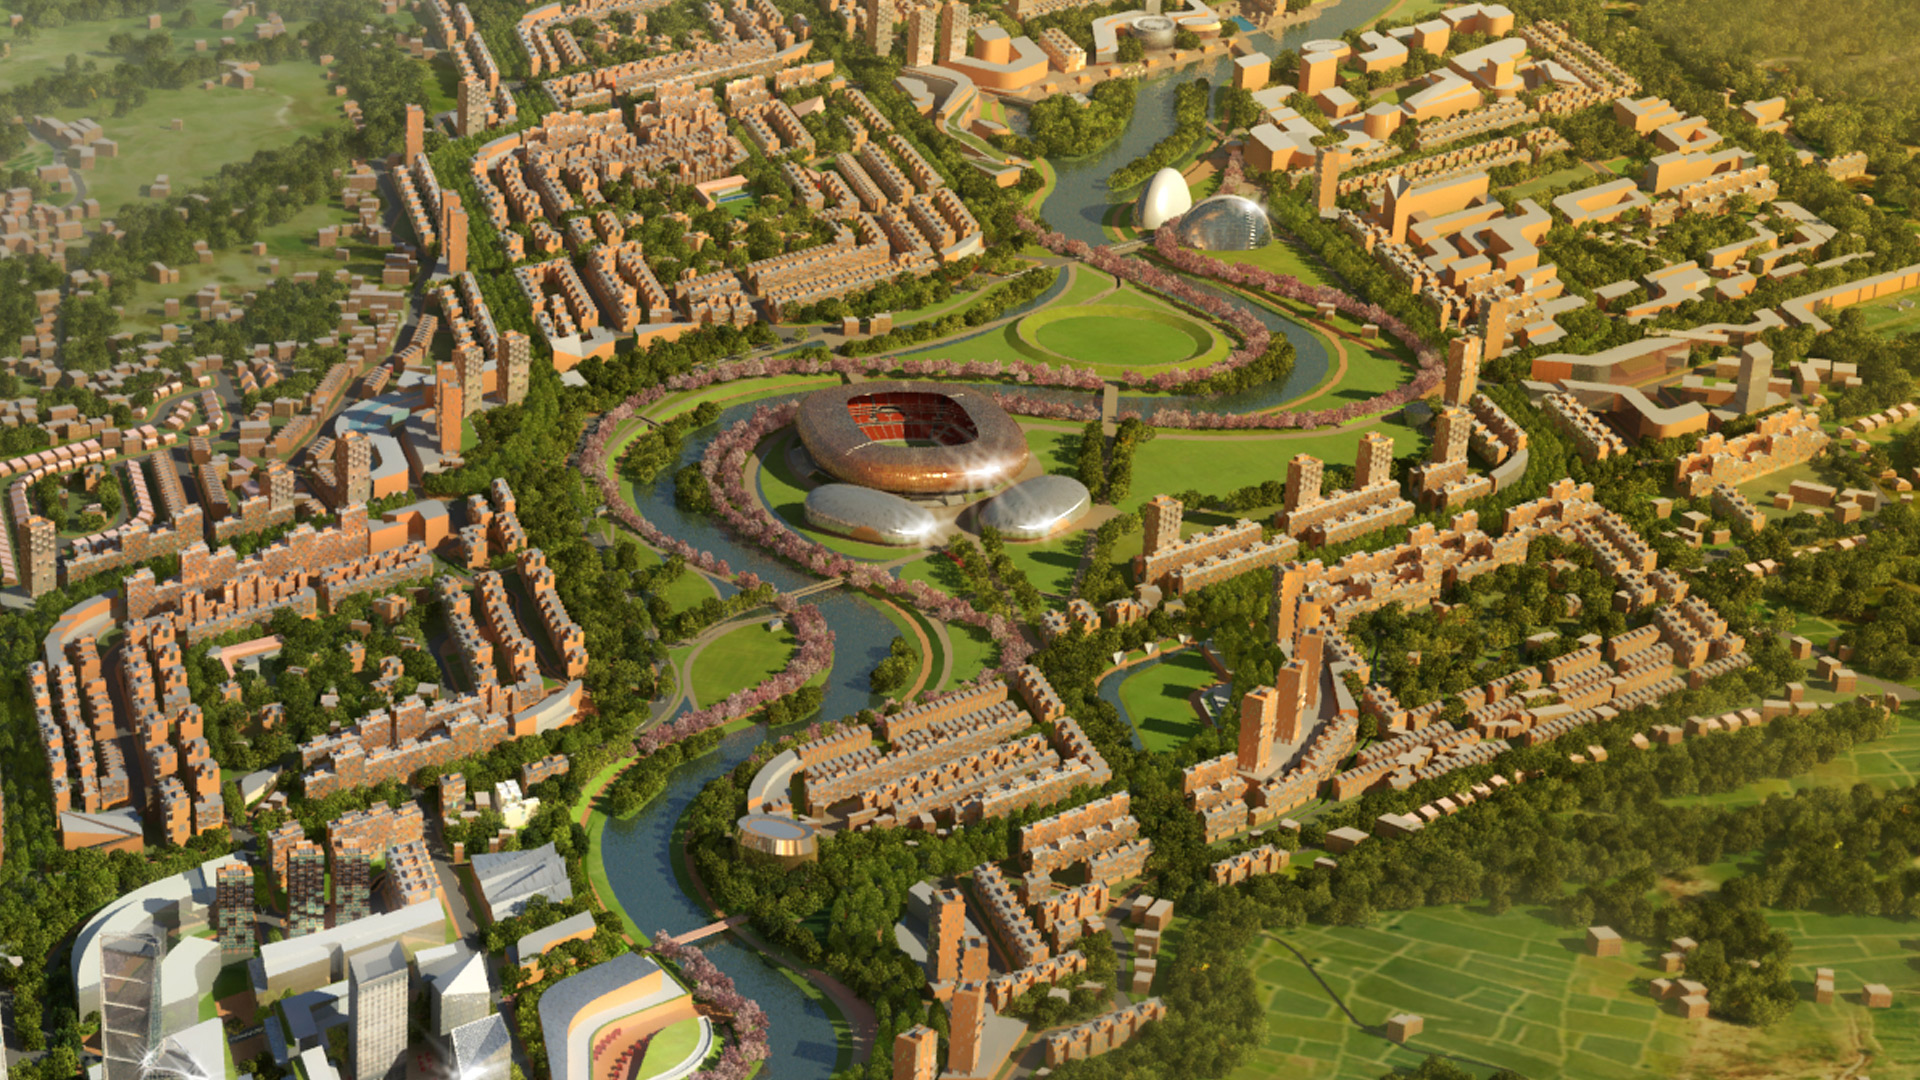 MAP-design-smart-city-architecture-planning-architect-kiran-mathema-aerial-view (3)